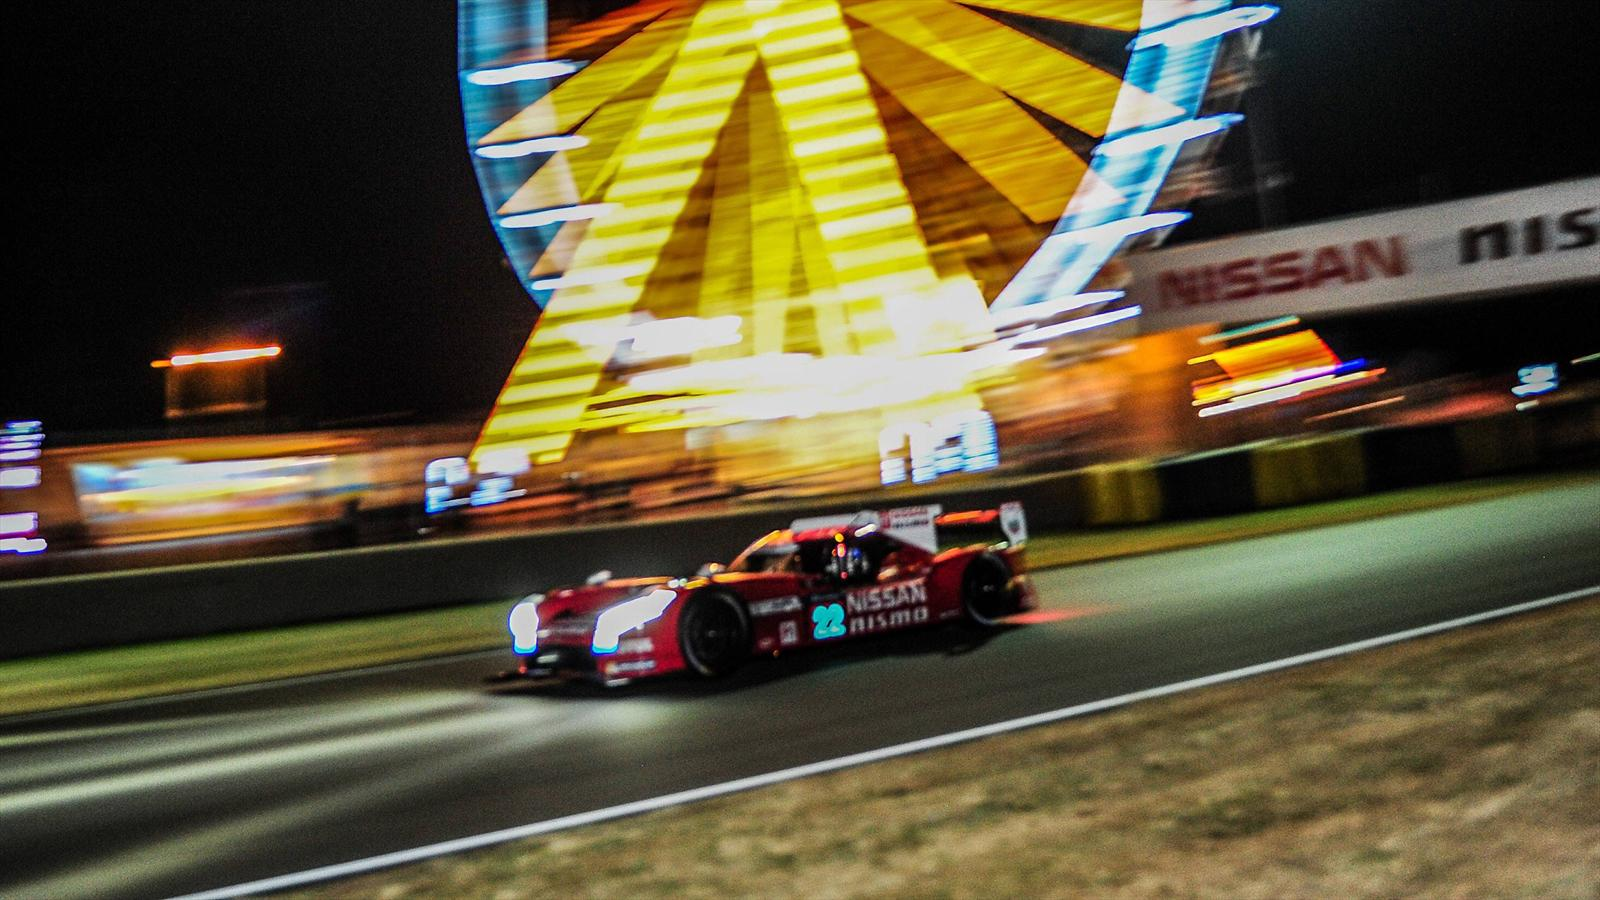 Le Mans 24 Hours 2016 preview: Live TV times, race details, sportscar drivers, track profile ...